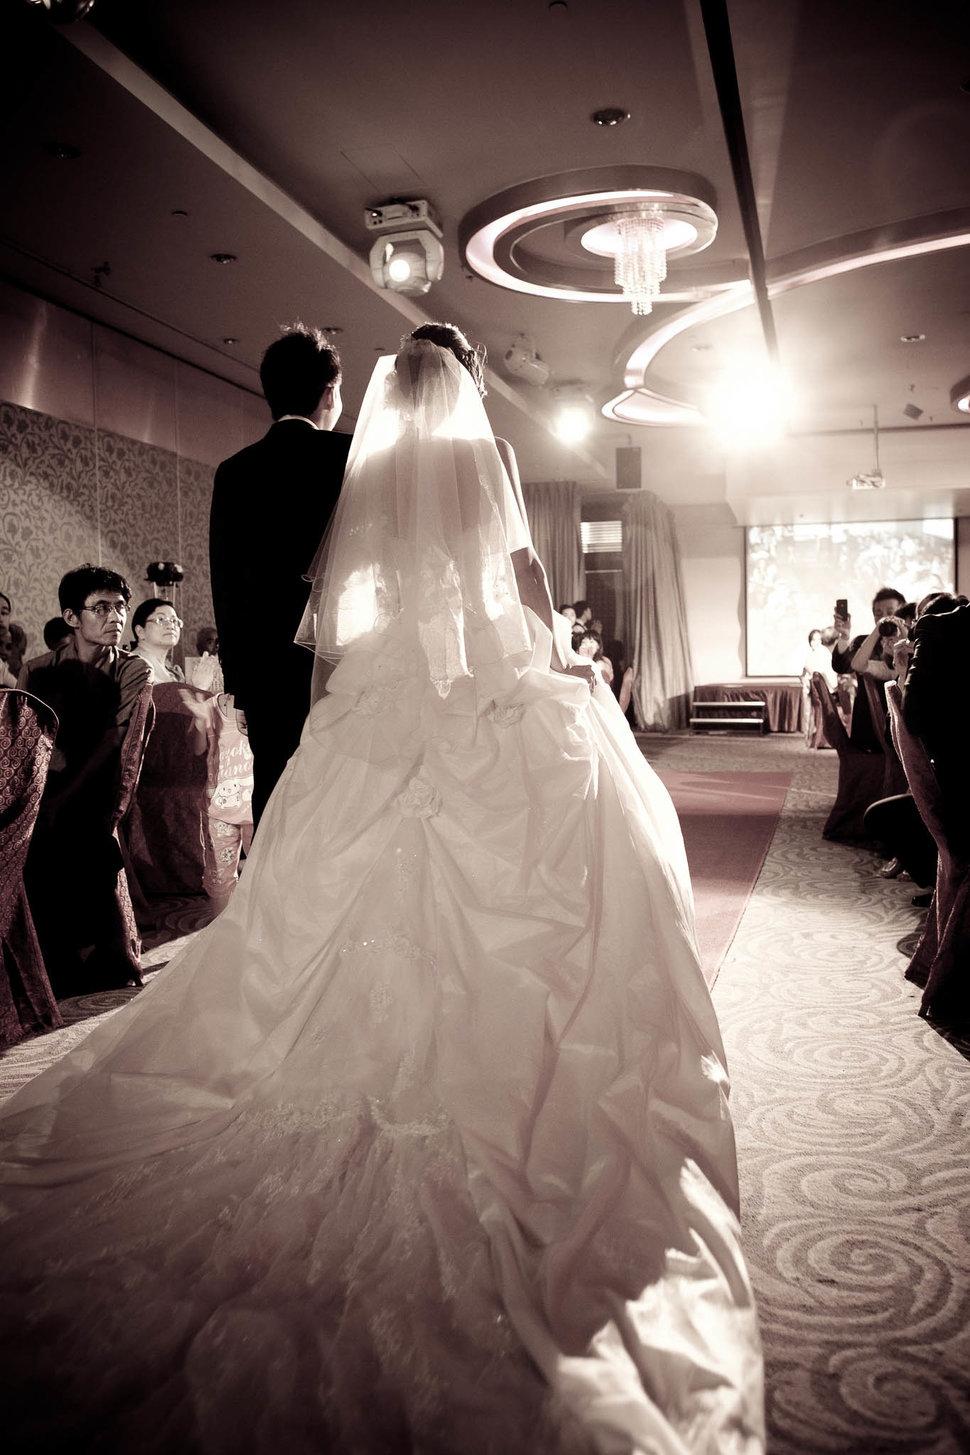 18PHOTO-敔帆❤️ 卿瑜(編號:242276) - 18PHOTO 婚紗影像攝影工作室 - 結婚吧